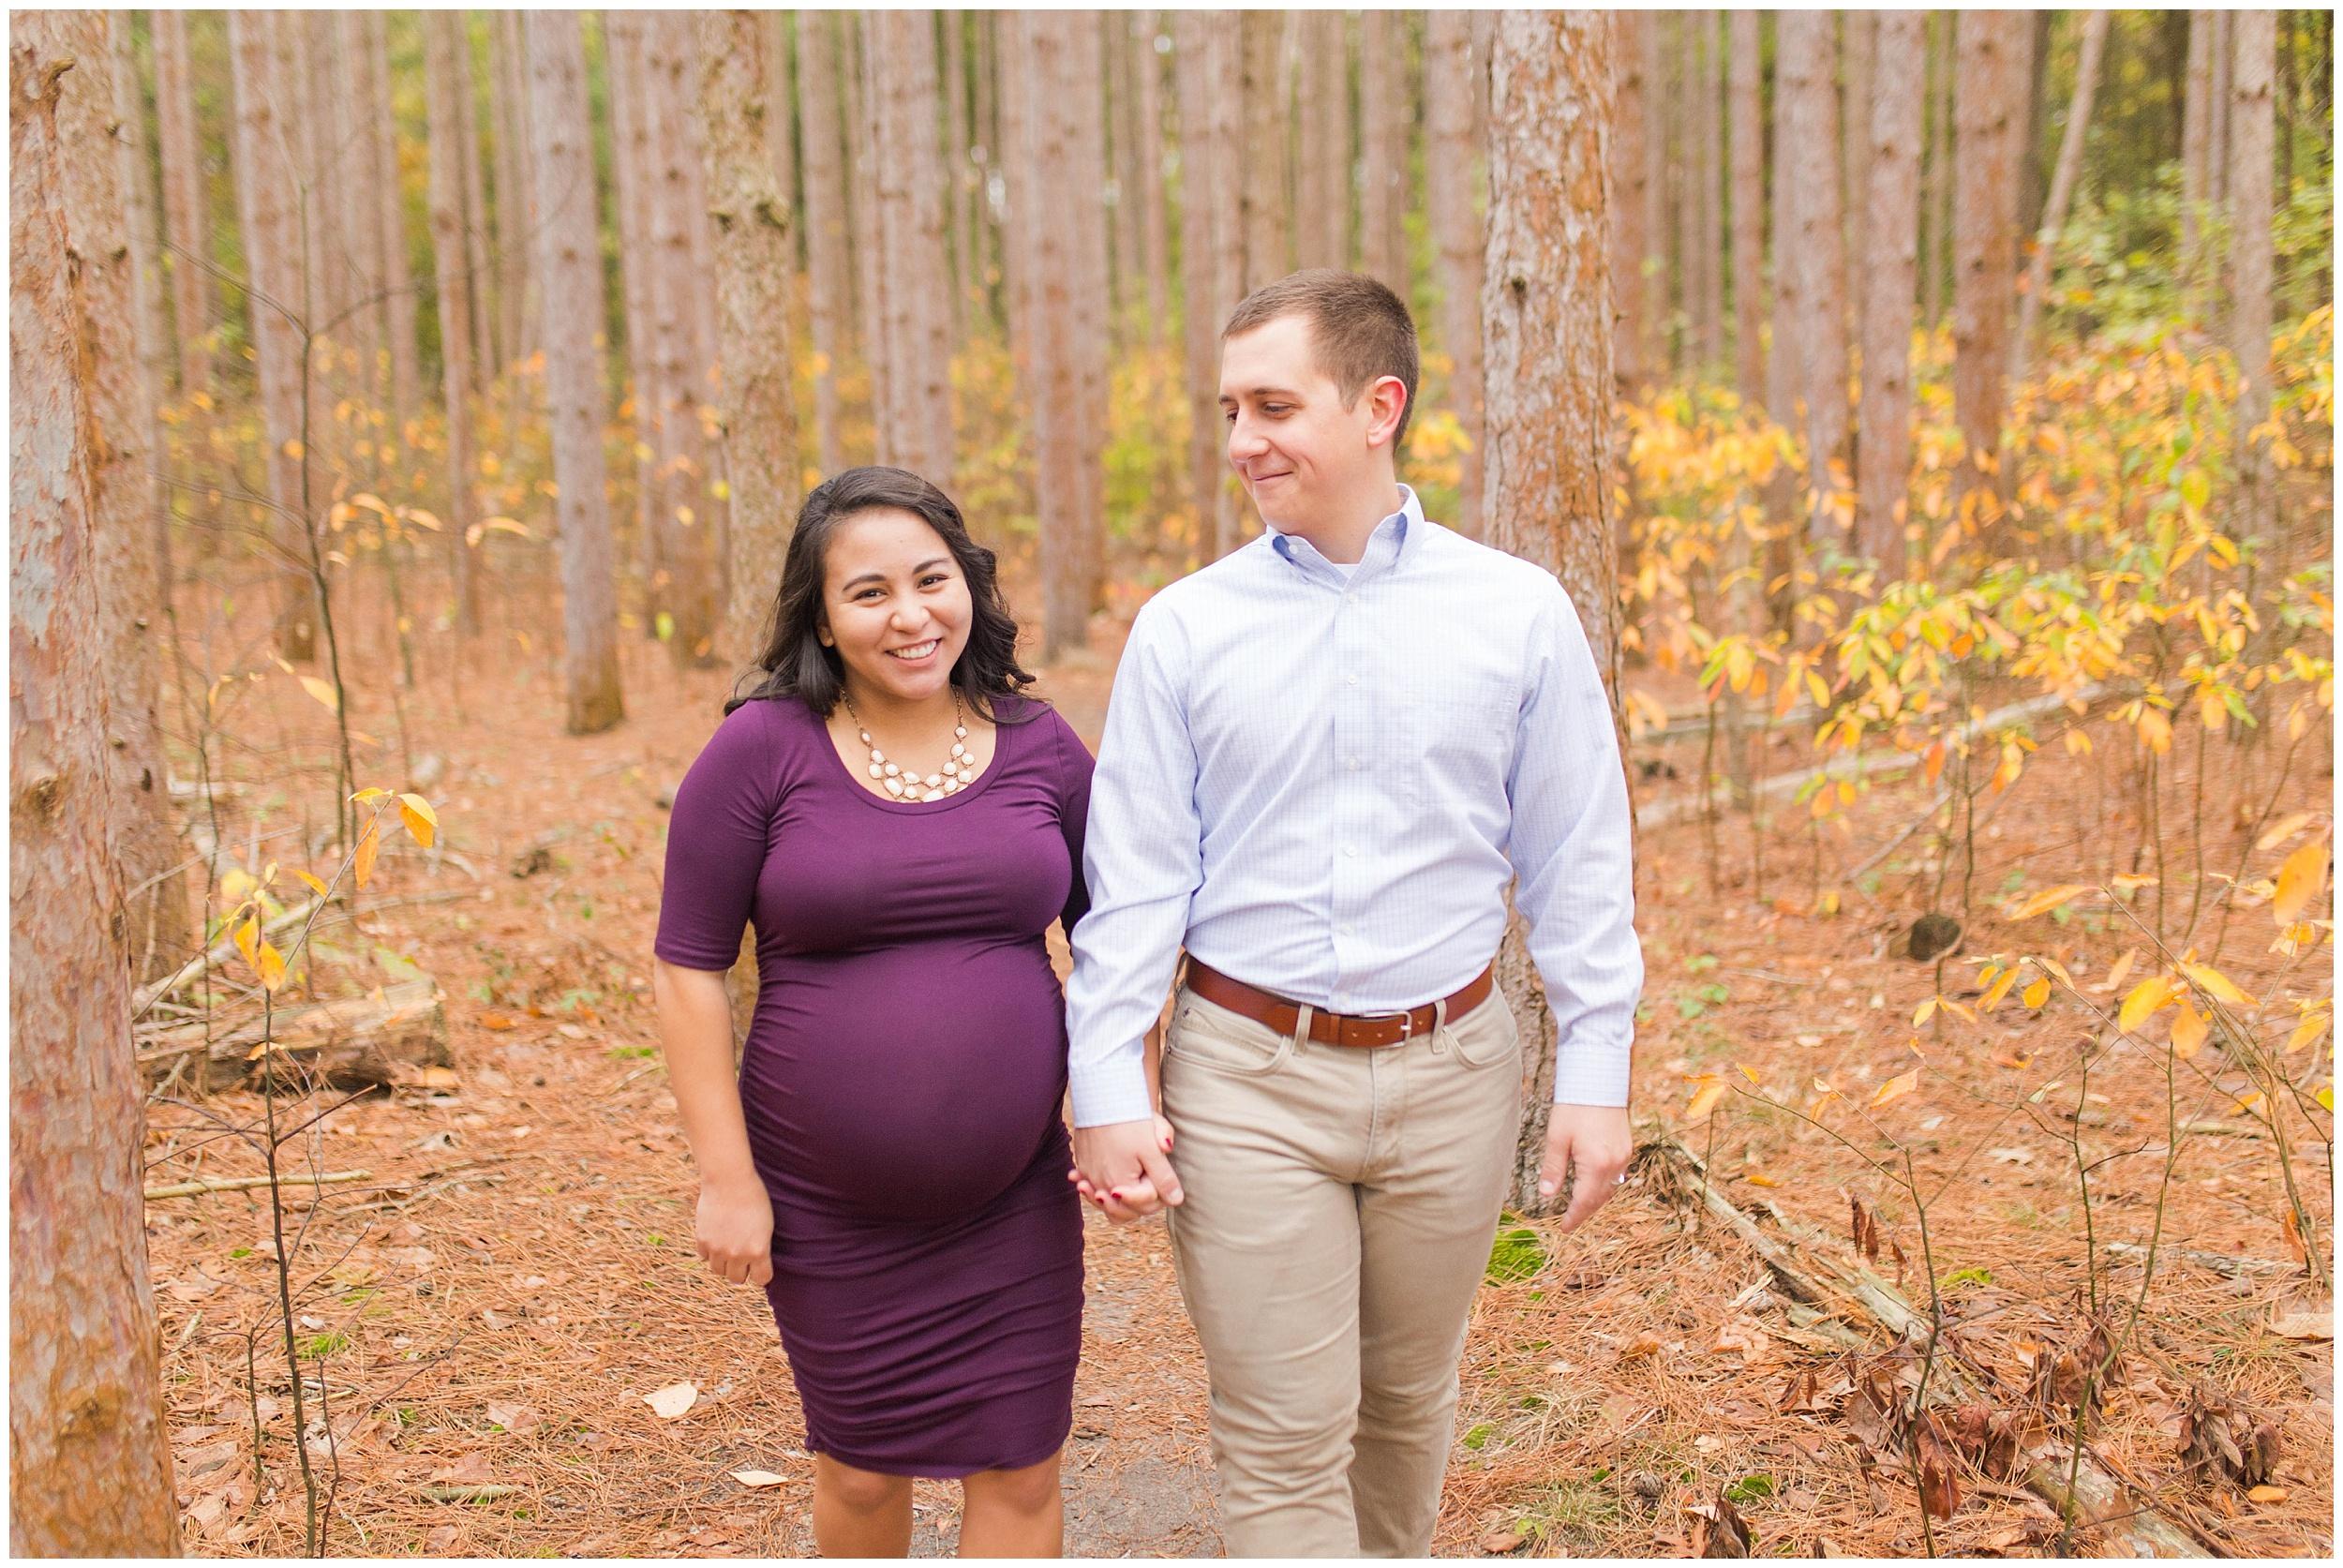 Holland_Michigan_Maternity_Photography_0007.jpg